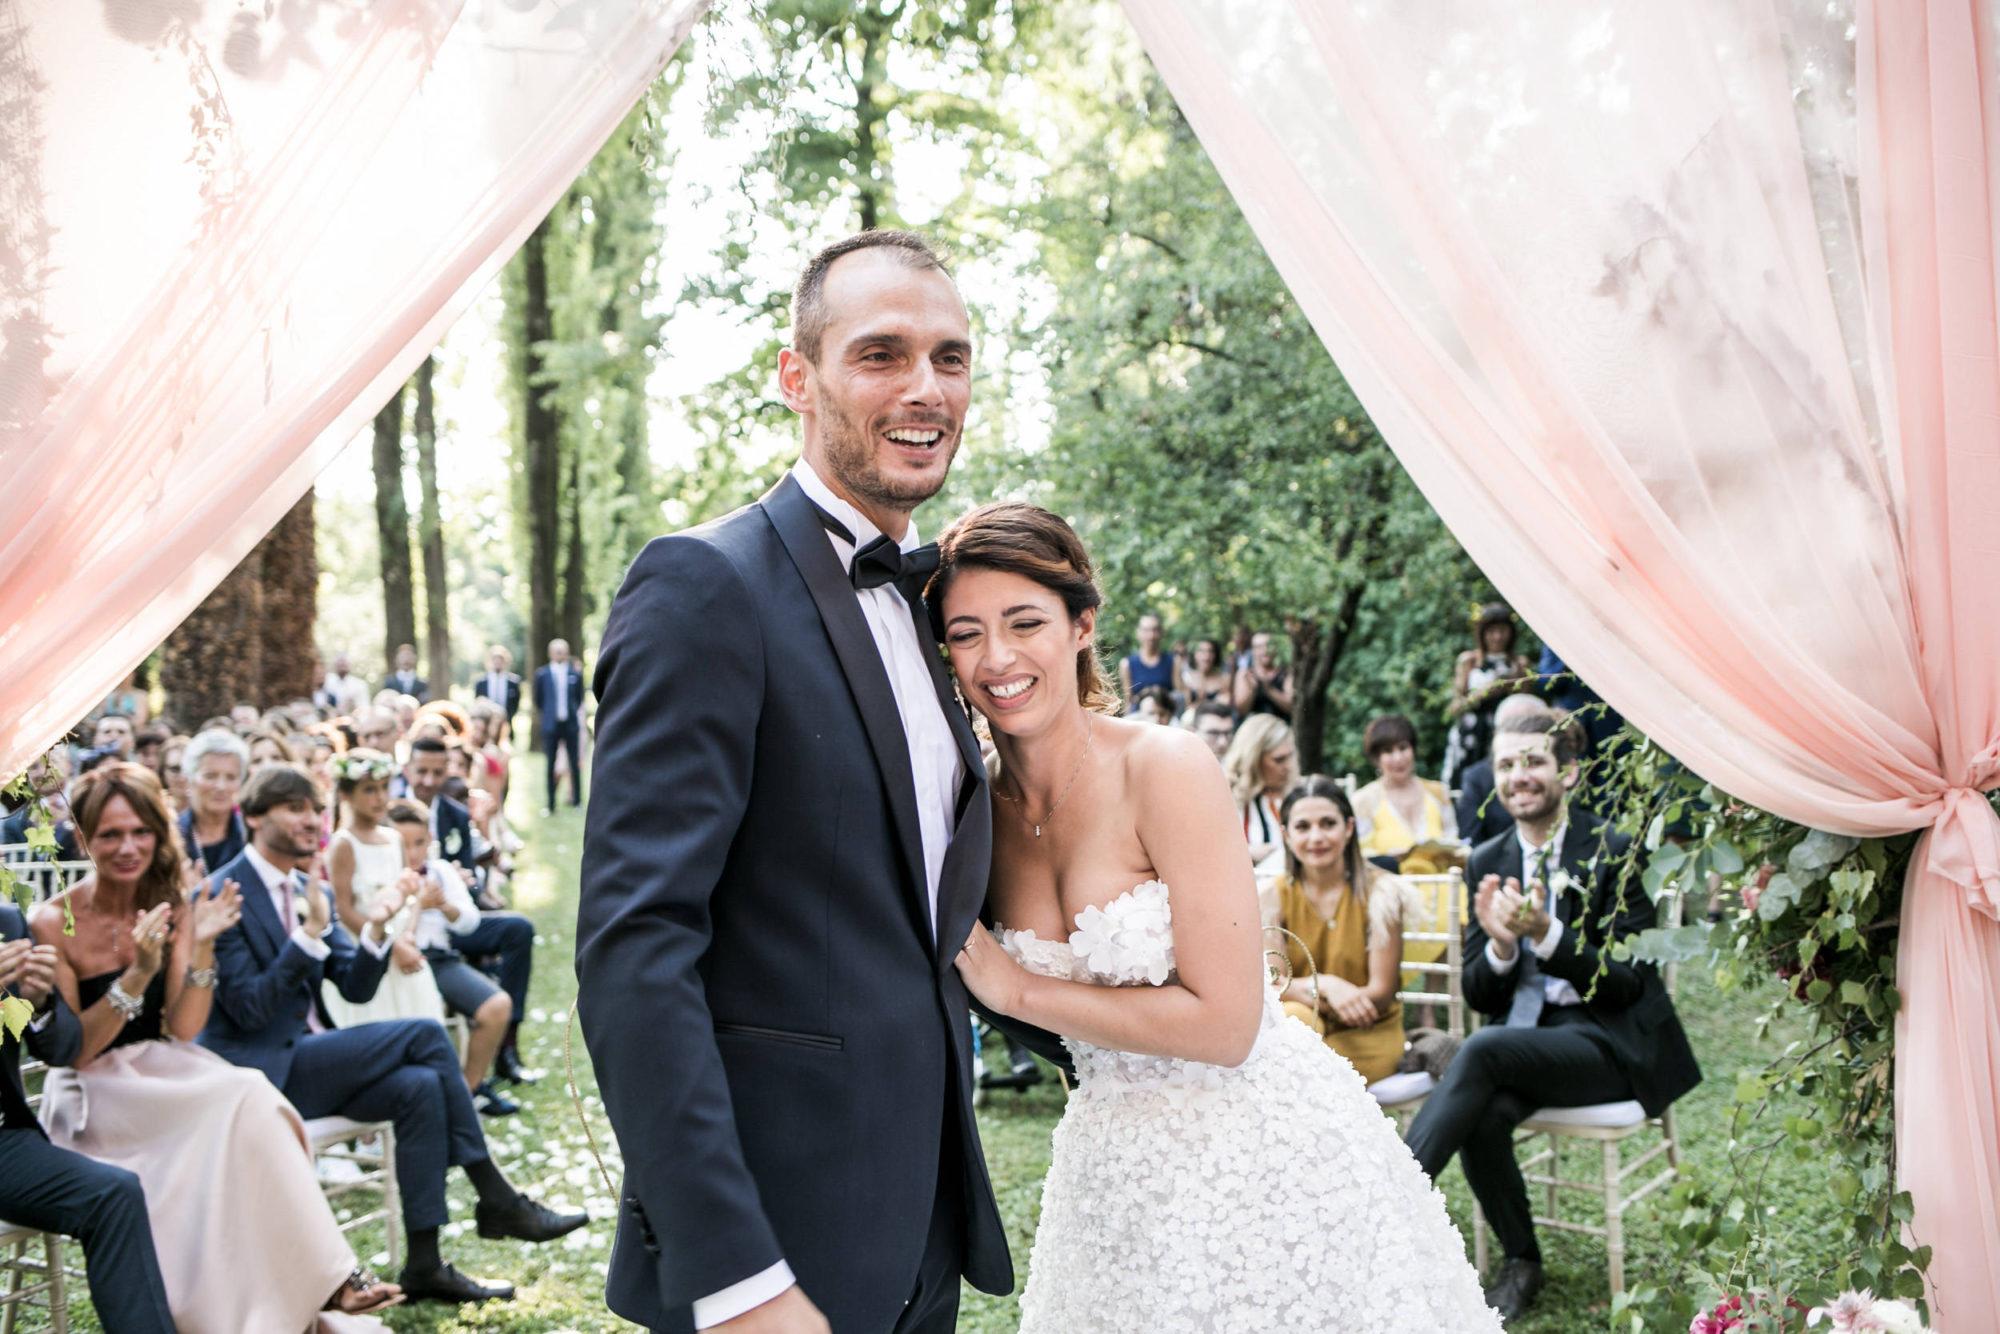 matrimonio_villa-ferrari-gussola_MI-058